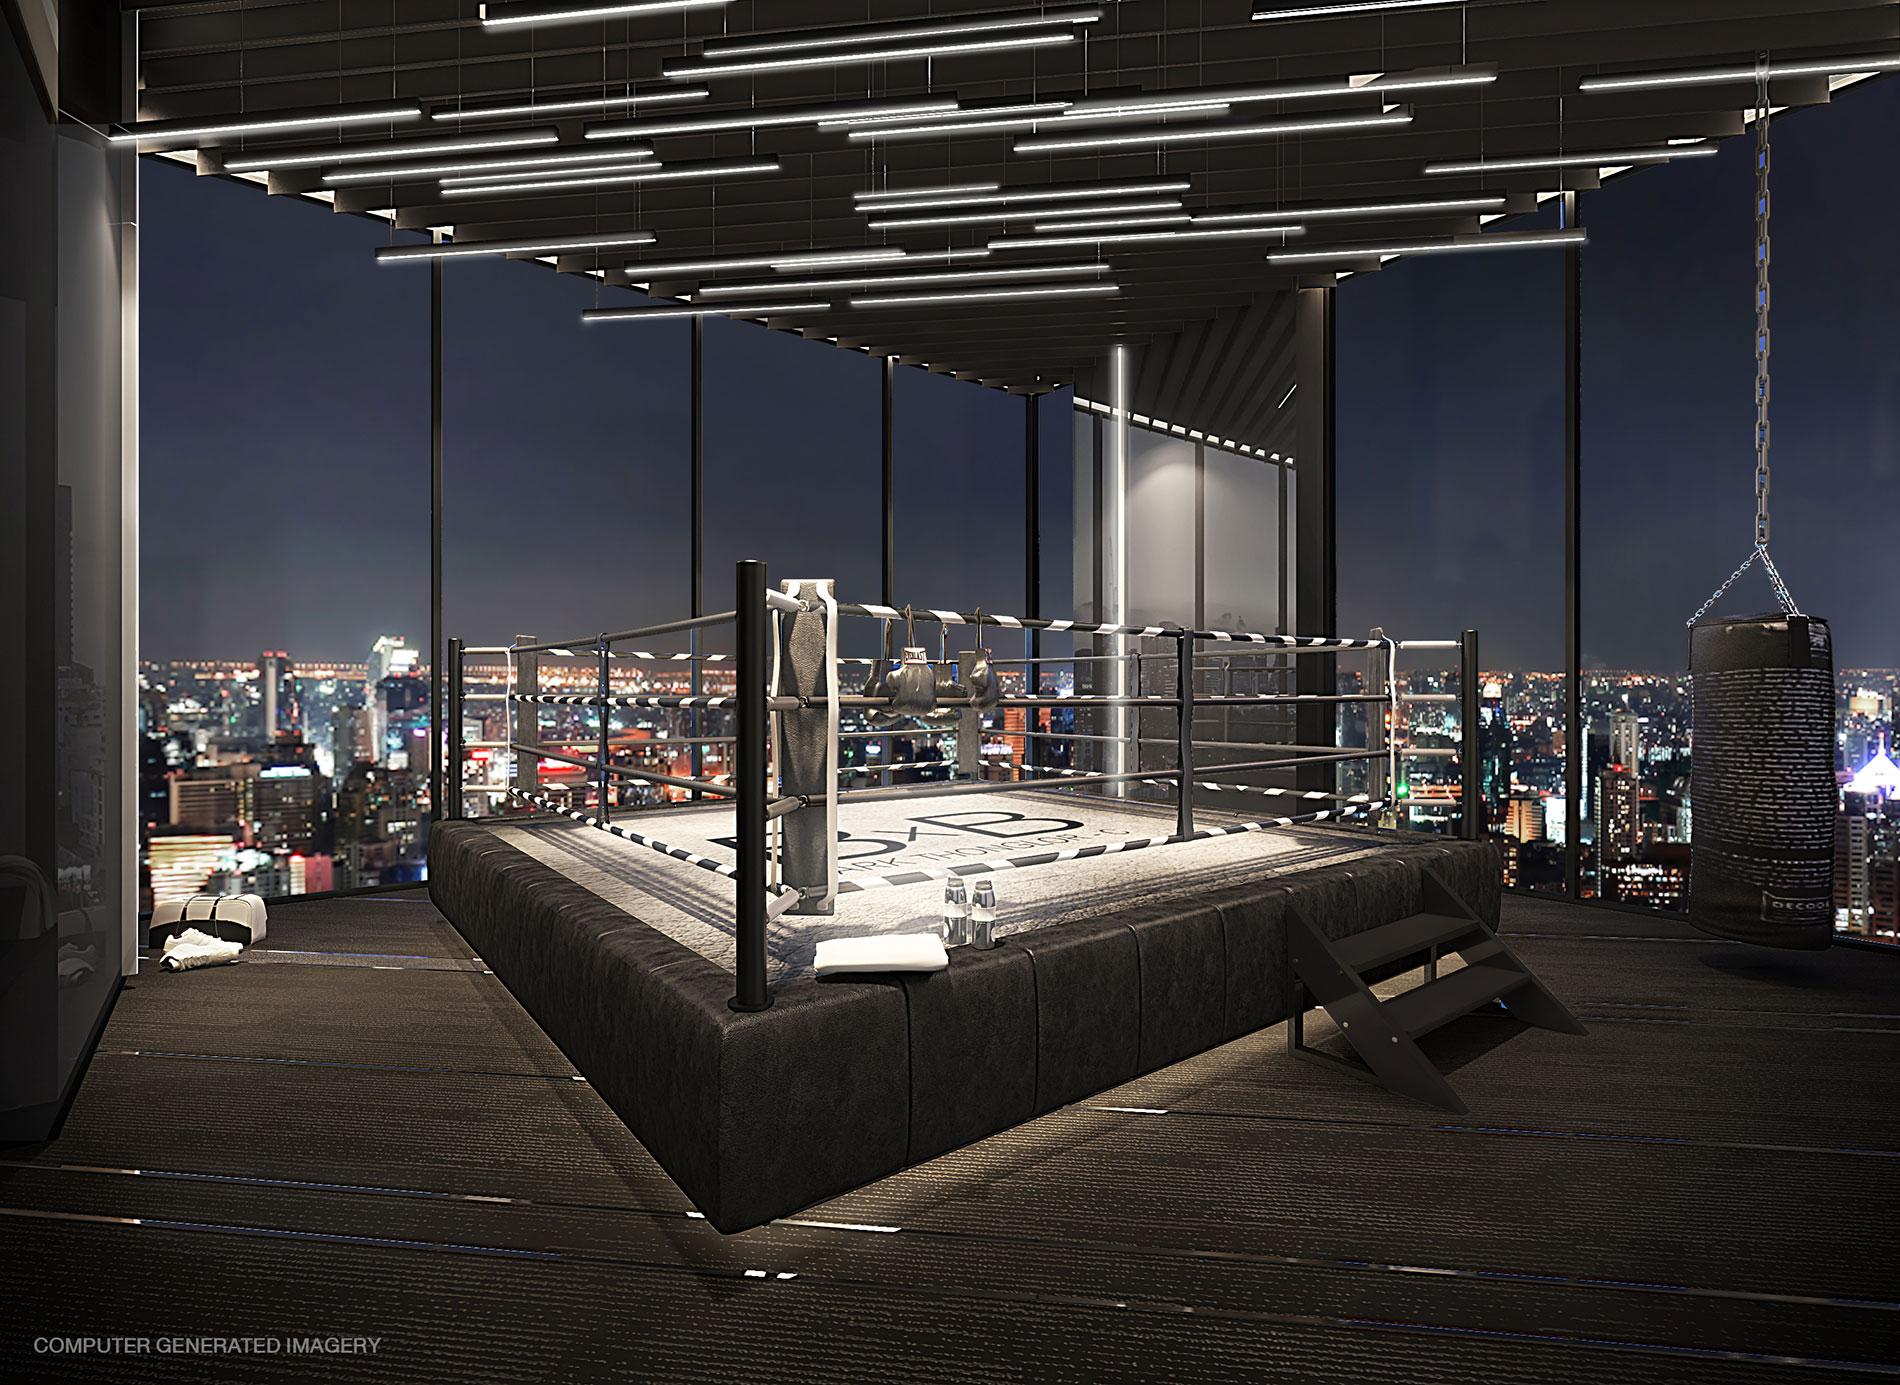 Building C: Boxing Gym ให้คุณได้ชาร์จพลัง ท่ามกลางสีสันของเมือง